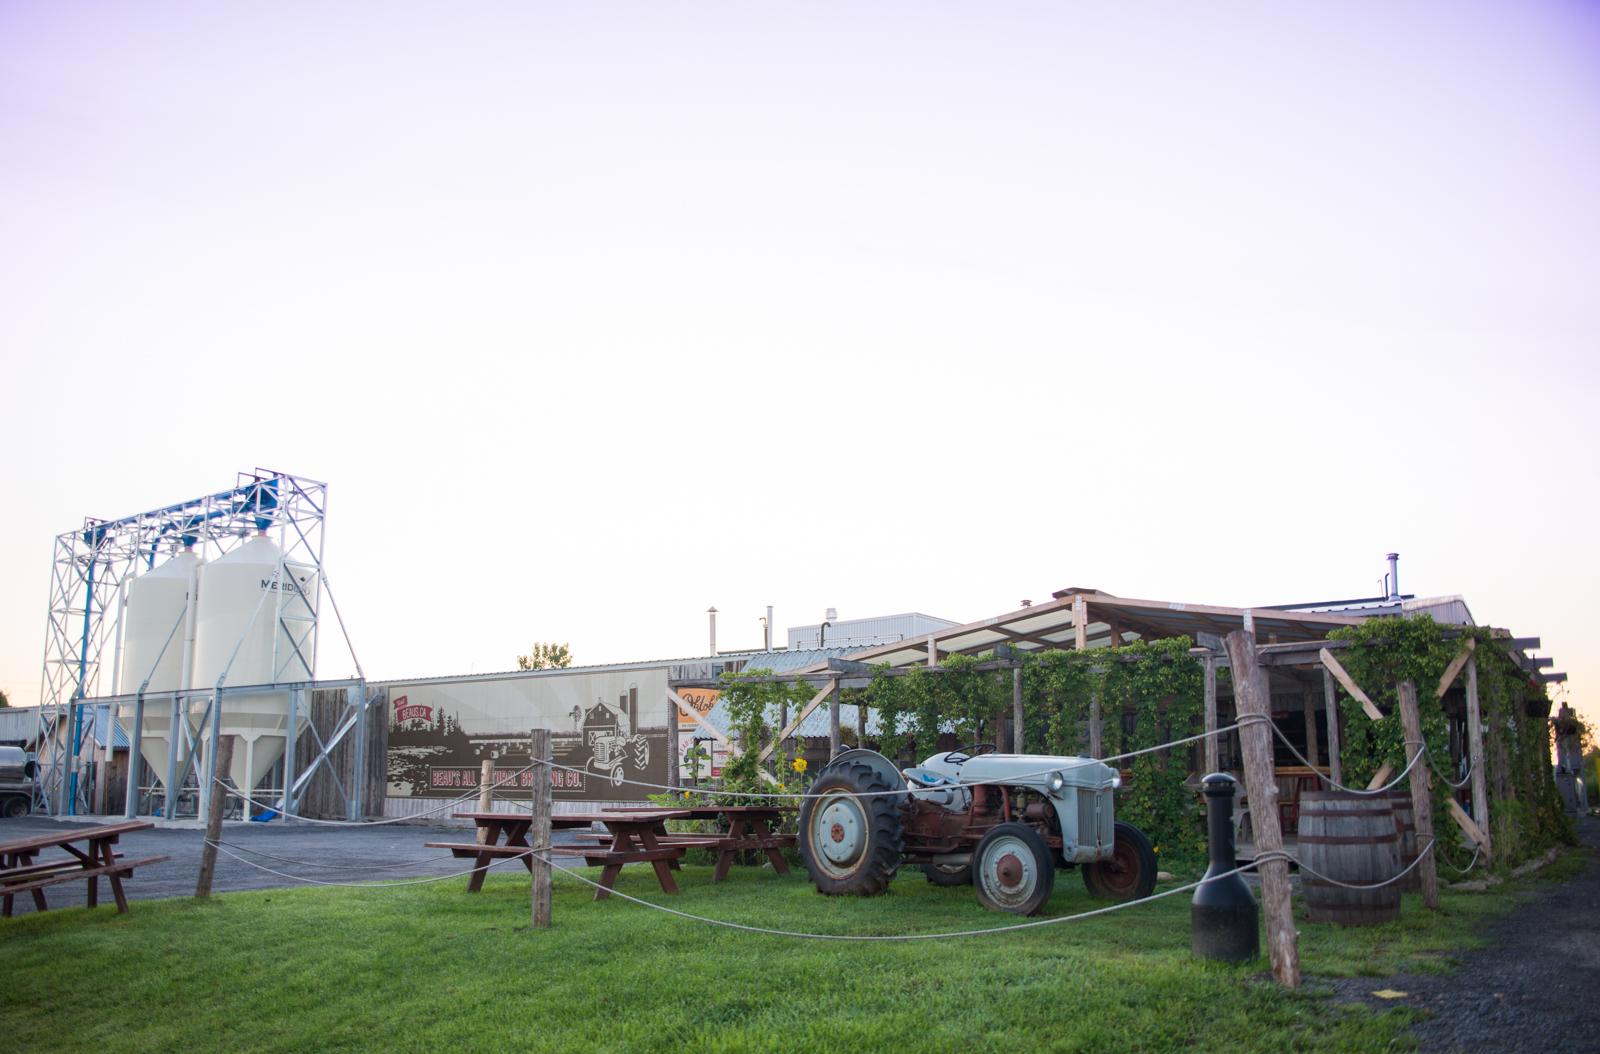 The brewery in Vankleek Hill, Ontario, Canada